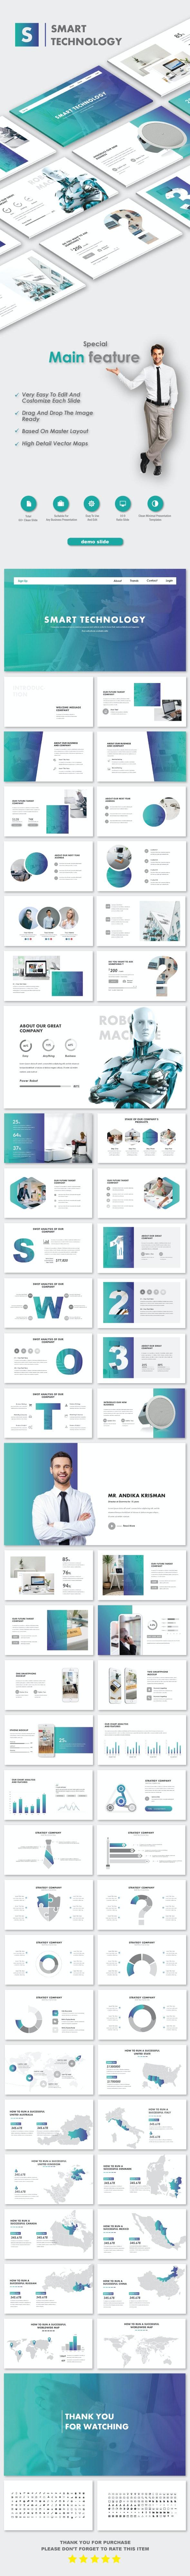 Smart Technology PowerPoint Templates - Business PowerPoint Templates